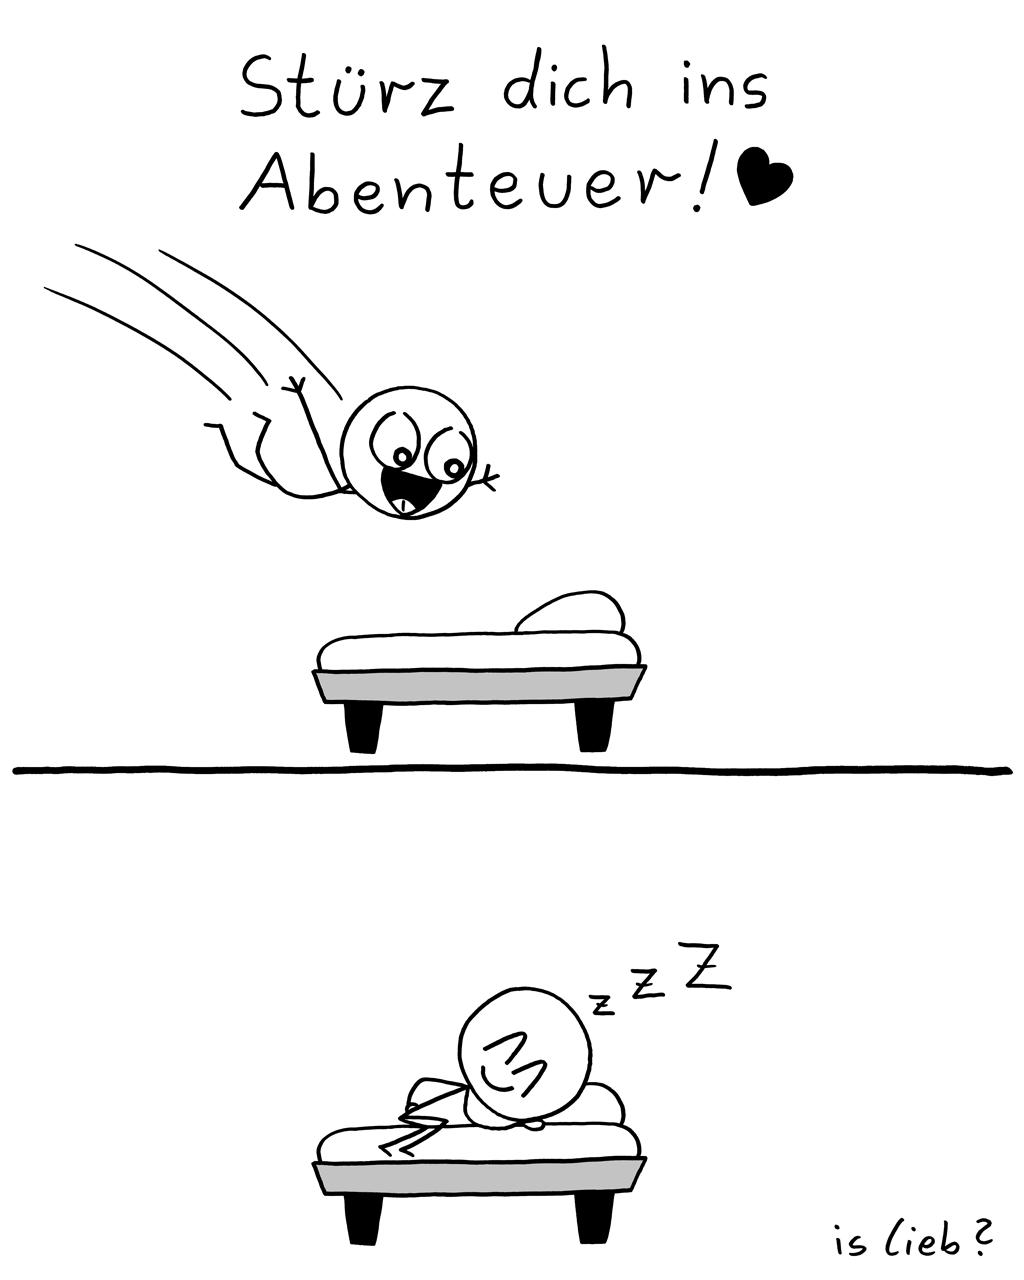 Abenteuer | Traum-Comic | is lieb?